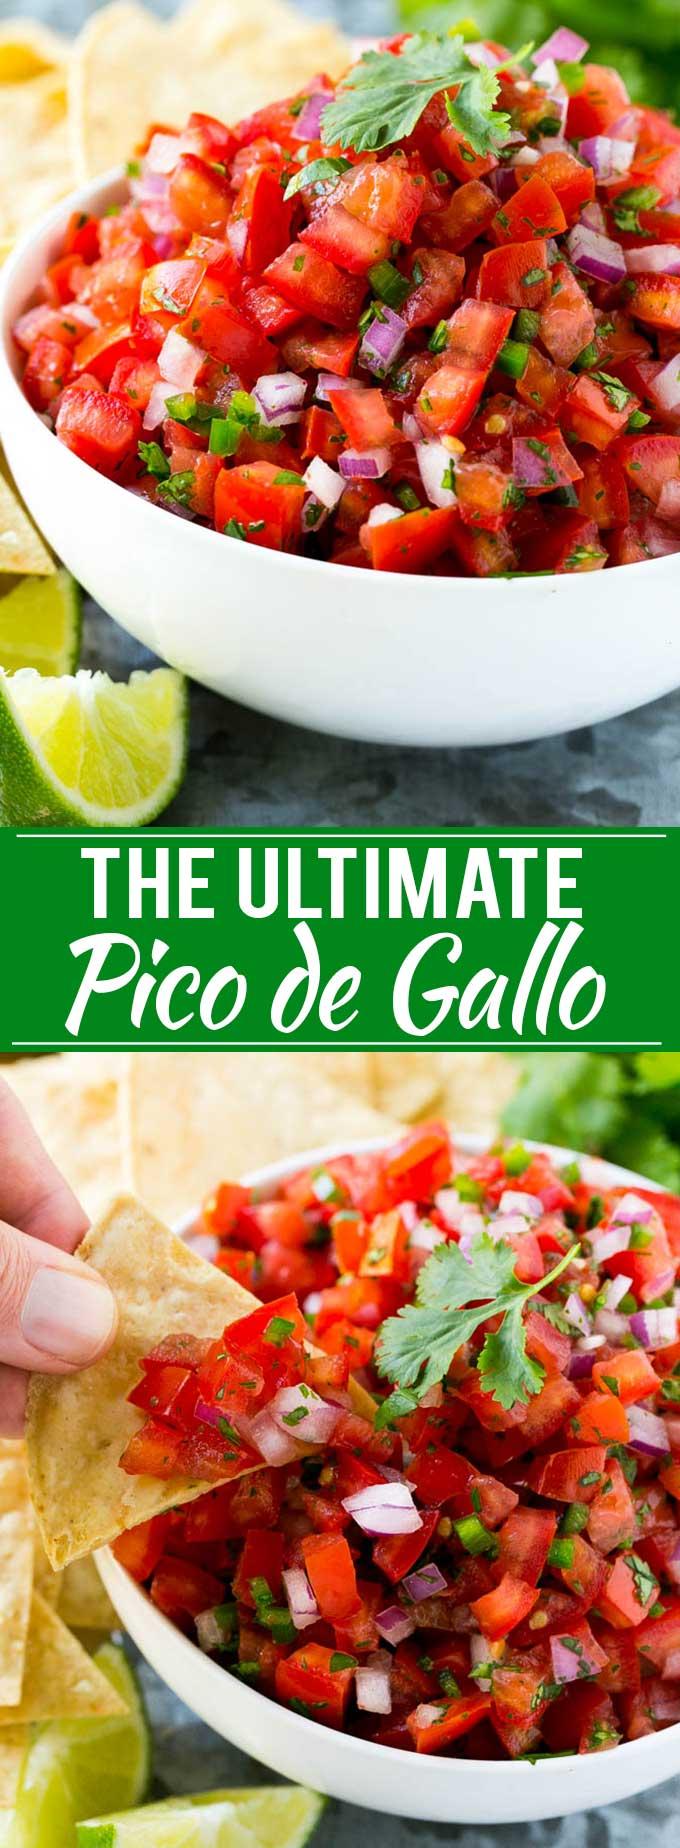 Pico de Gallo Recipe | Homemade Salsa Recipe | Salsa Fresca Recipe